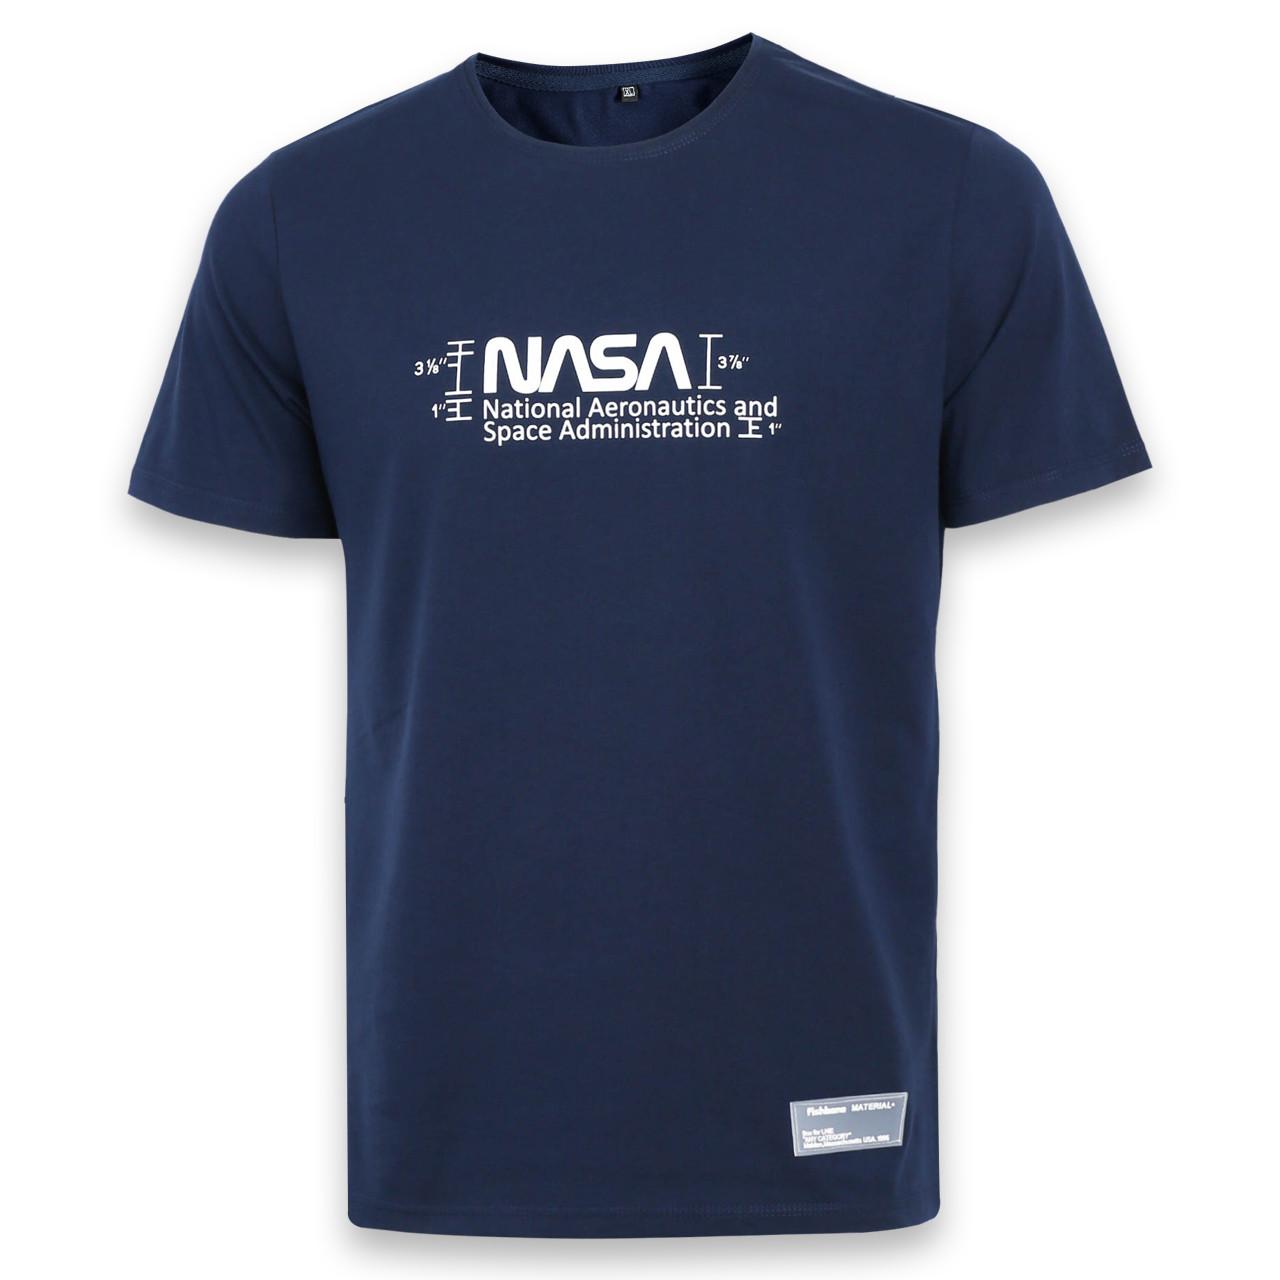 Футболка мужская т синяя с принтом NASA №2 Ф-10 DBLU L(Р) 20-800-020-001